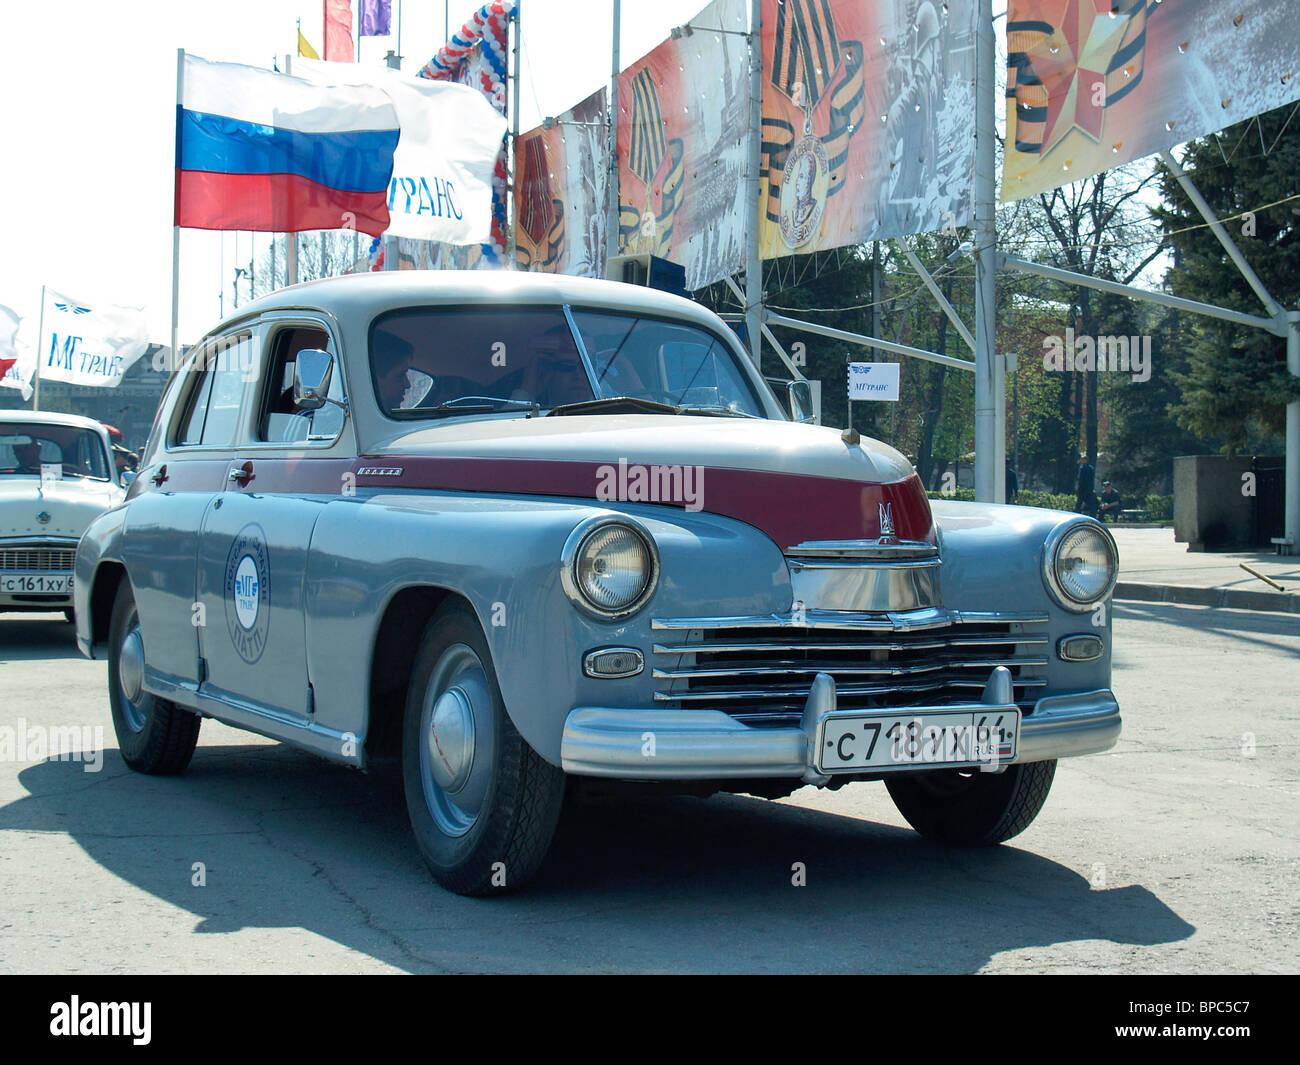 Vintage Automobiles Stock Photos & Vintage Automobiles Stock Images ...